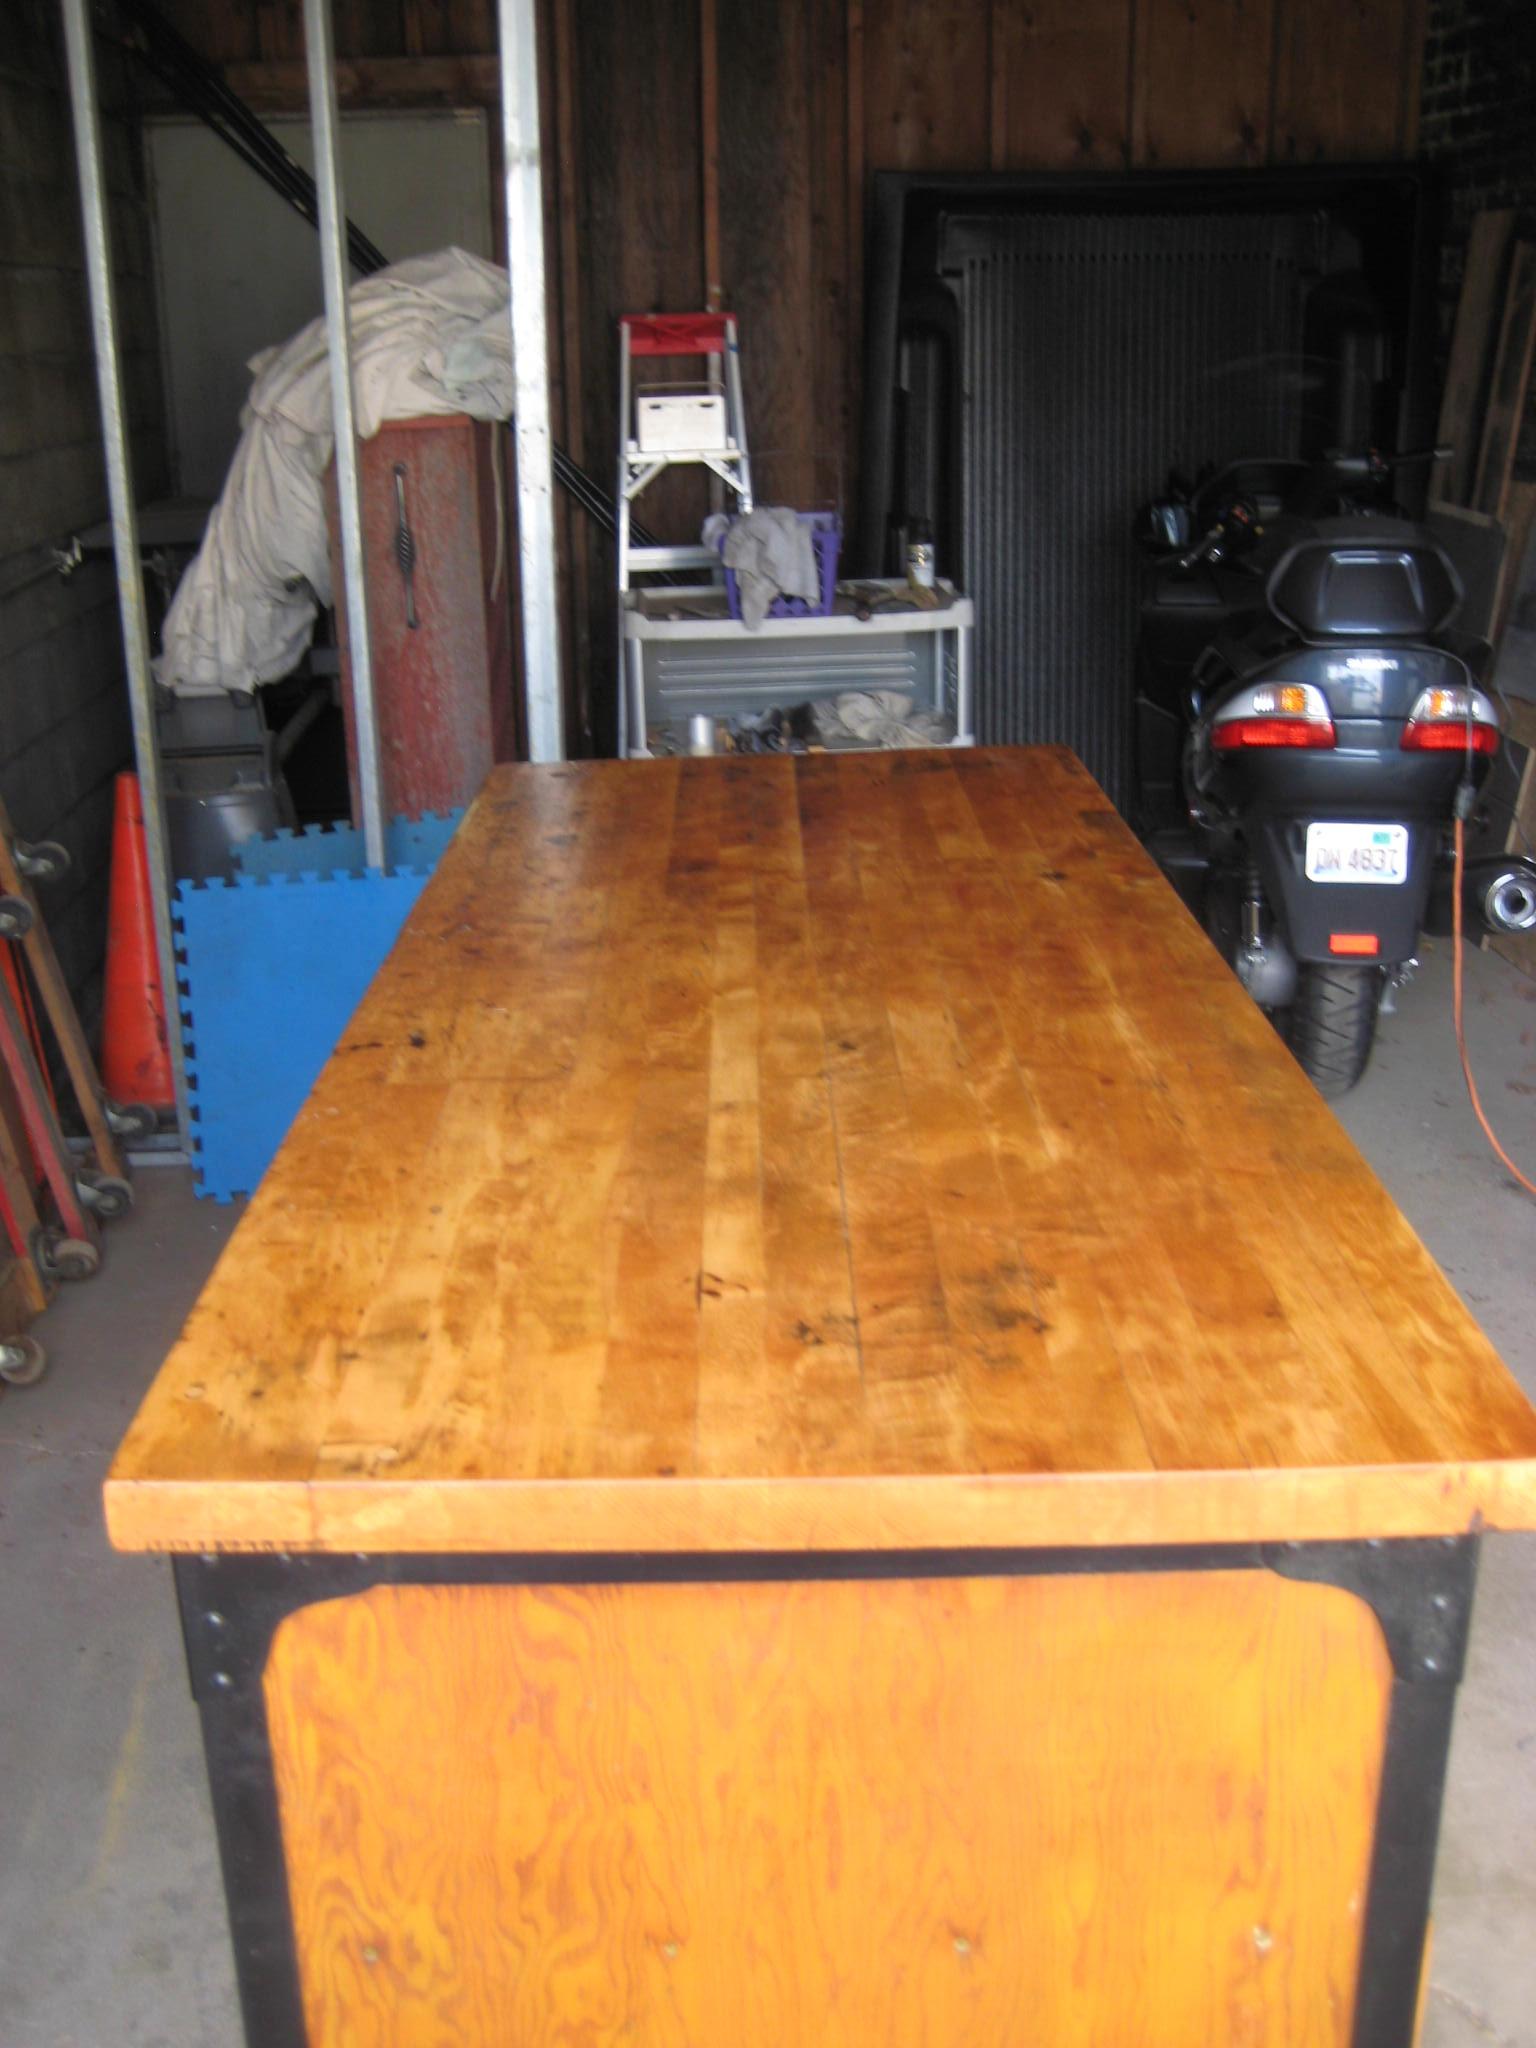 Enjoyable Vintage Industrial Work Bench For Sale Antiques Com Frankydiablos Diy Chair Ideas Frankydiabloscom